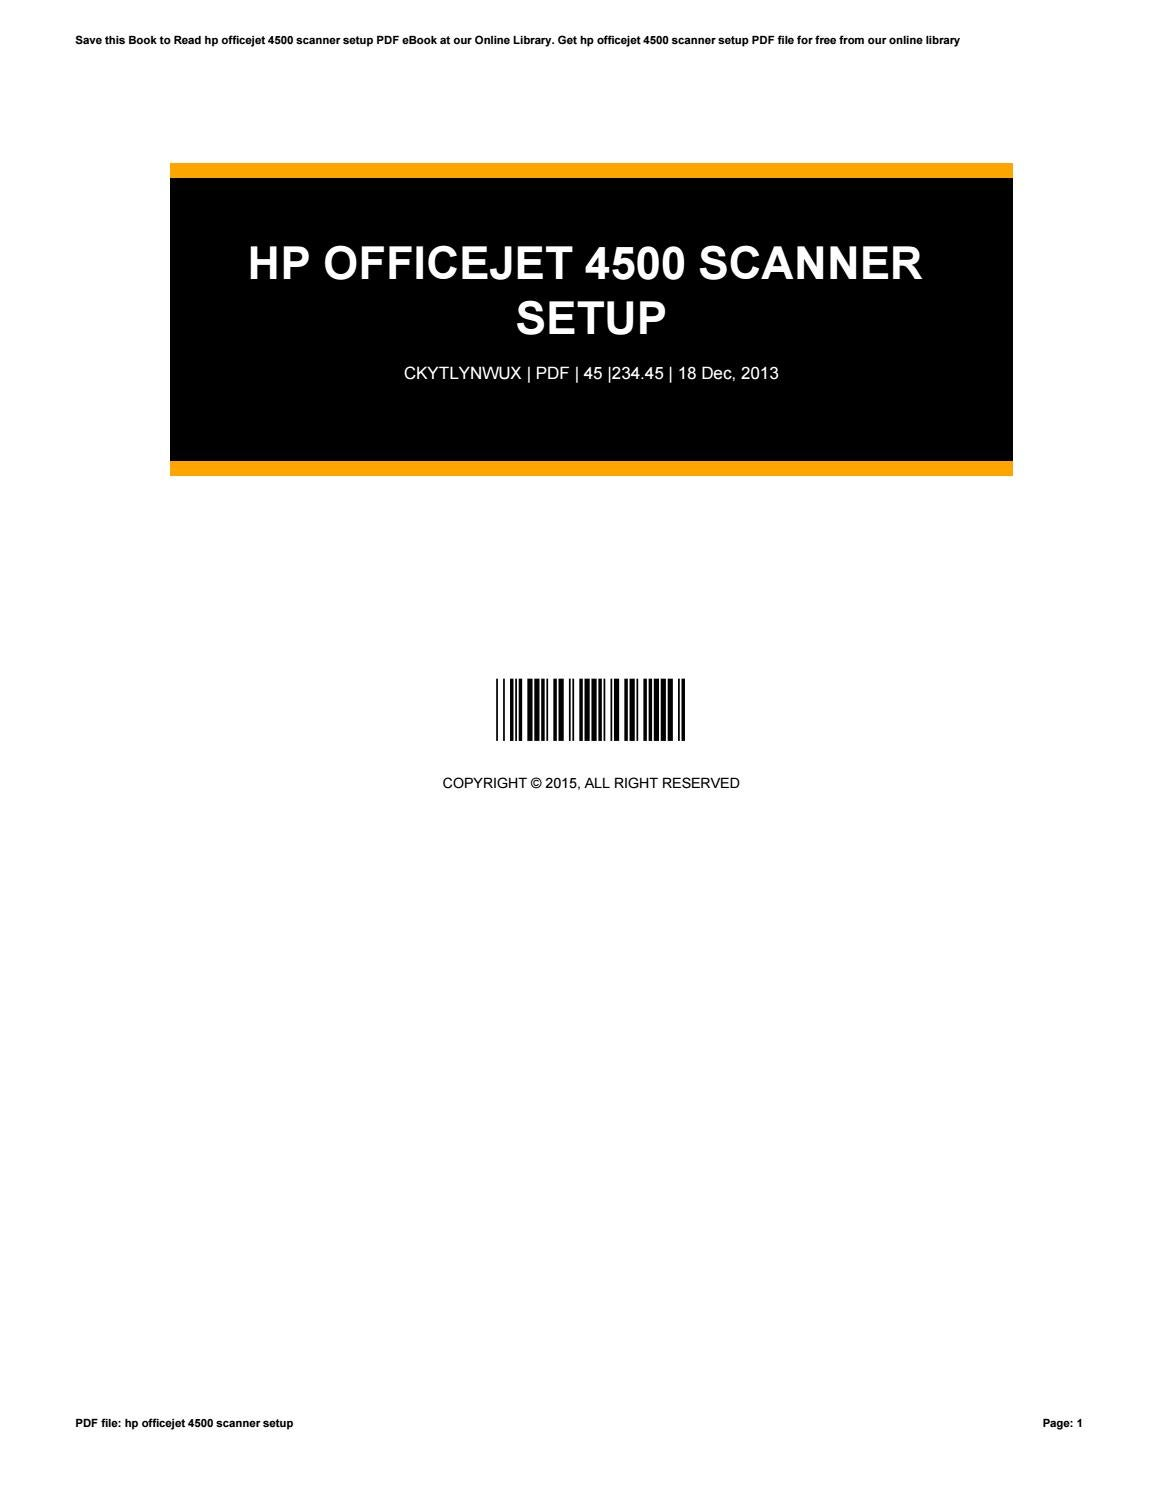 hp officejet 4500 desktop driver mac